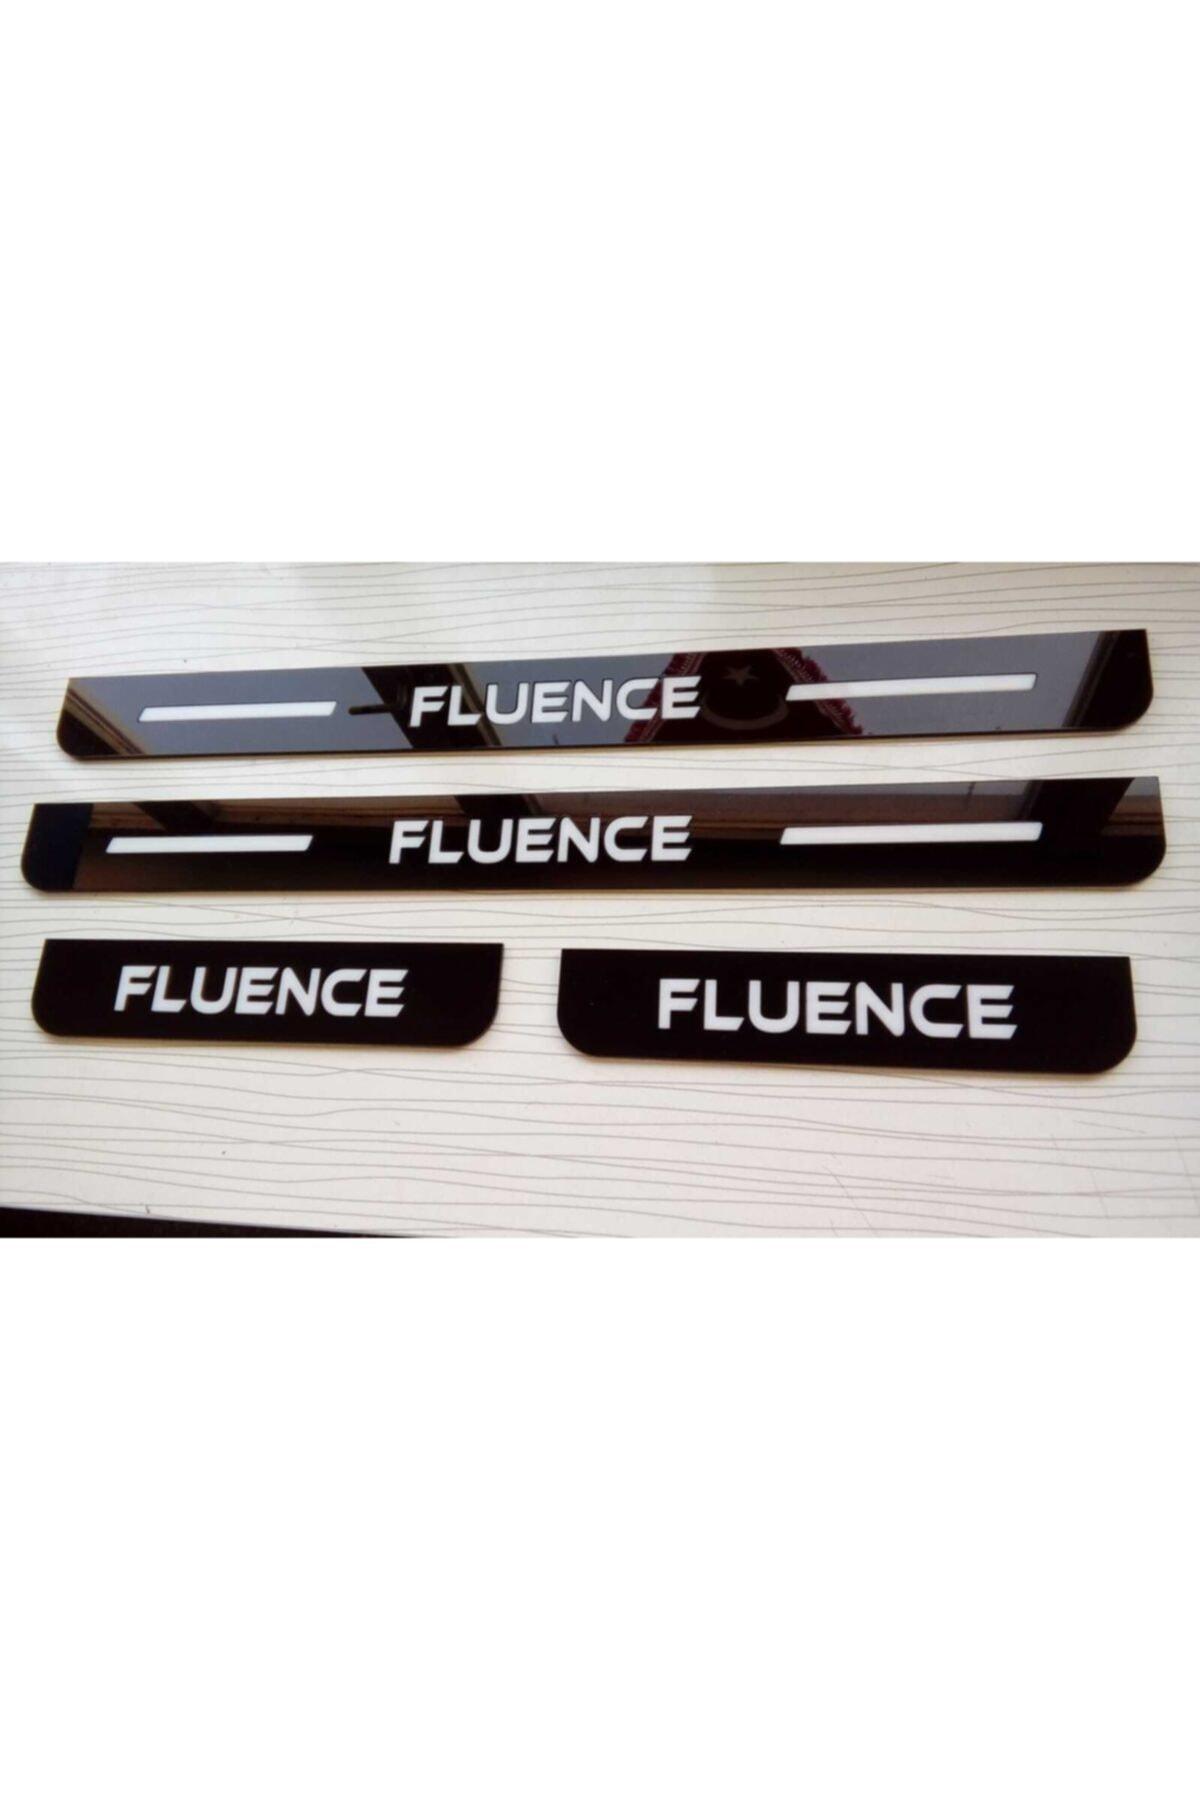 3M Renault Fluence 2006-2010 Uyumlu Lazer Kesim Pleksi Kapı Eşiği 1